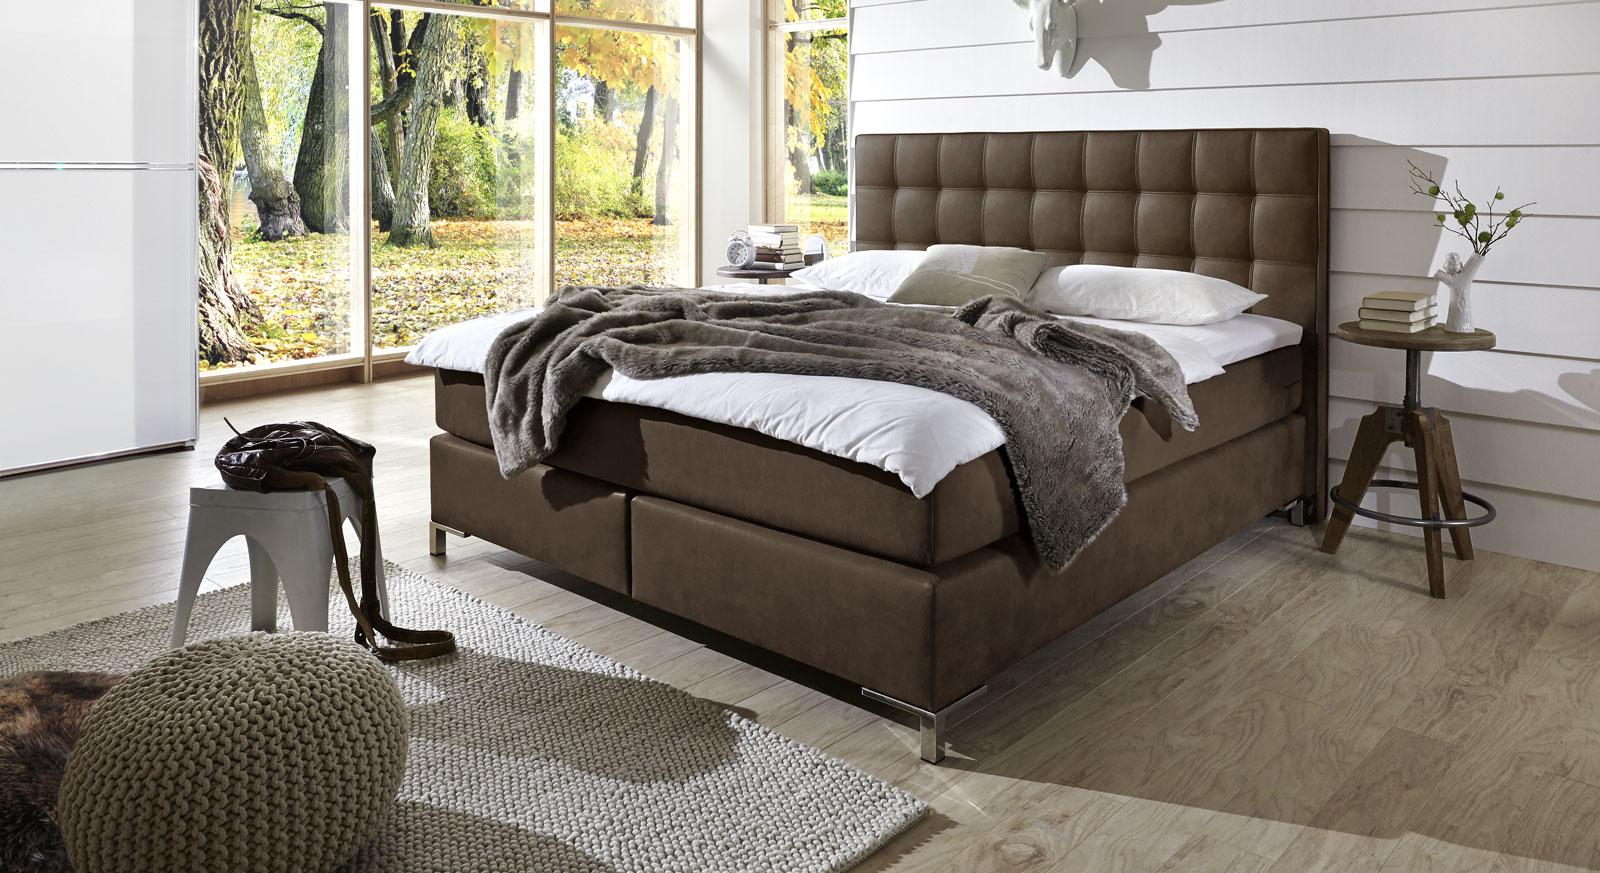 boxspringbett luxus. Black Bedroom Furniture Sets. Home Design Ideas